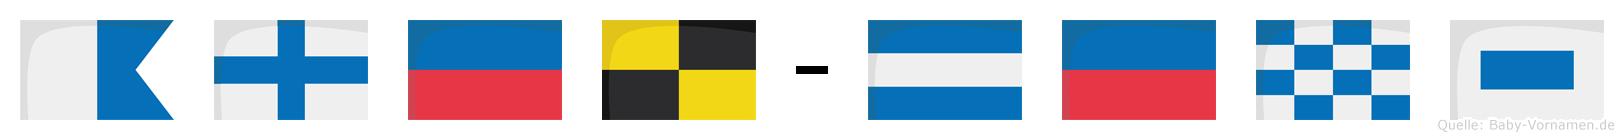 Axel-Jens im Flaggenalphabet